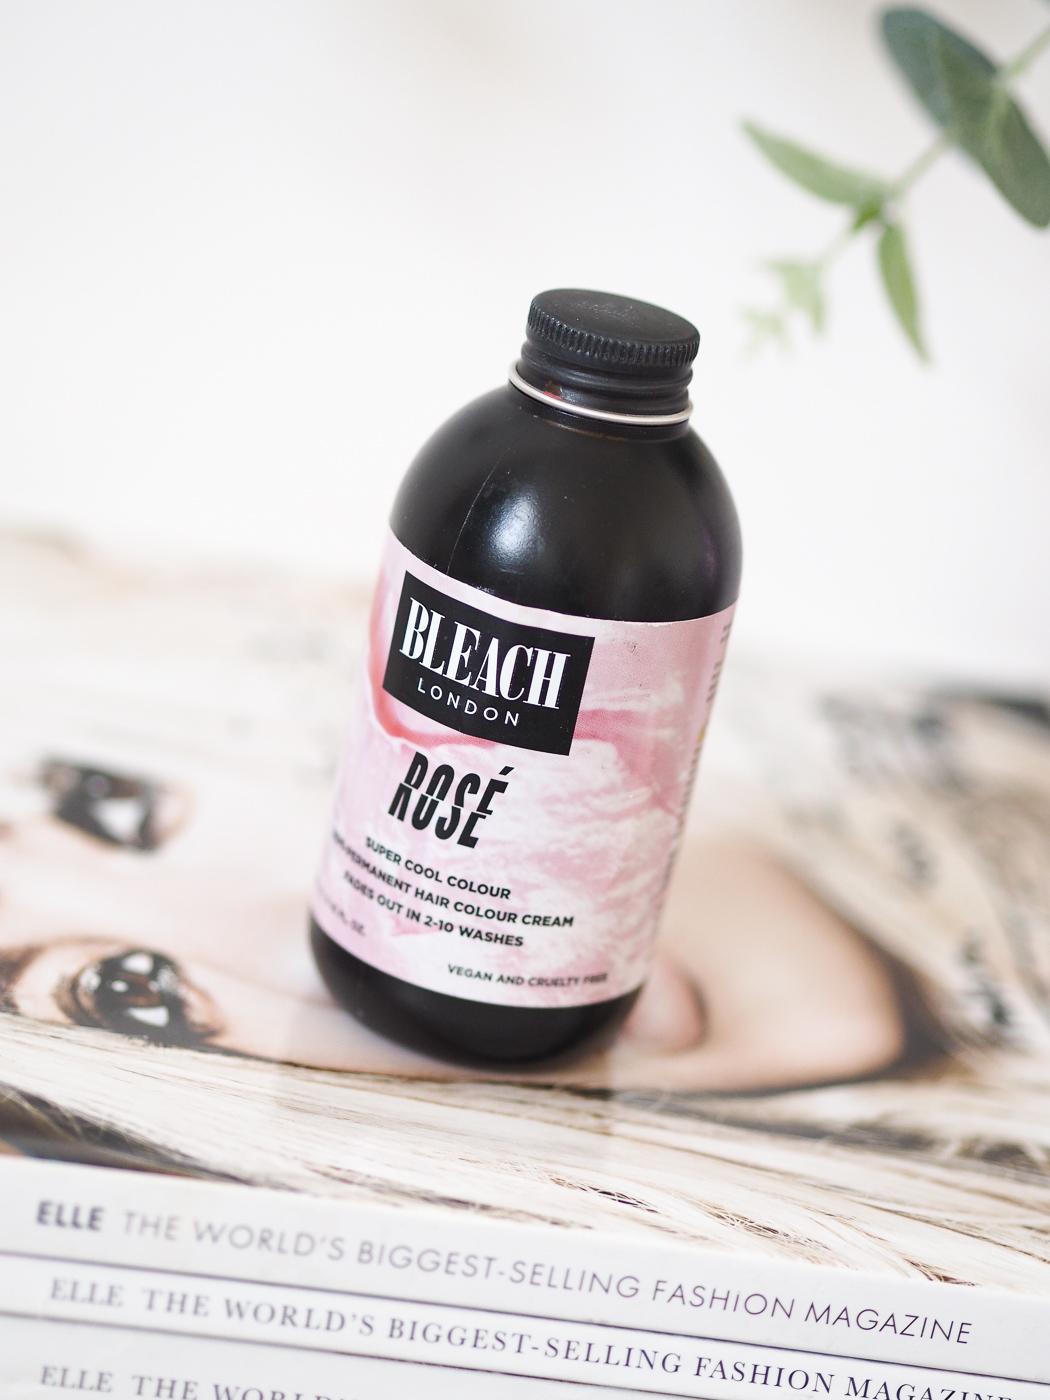 Bleach London Rose pink dye